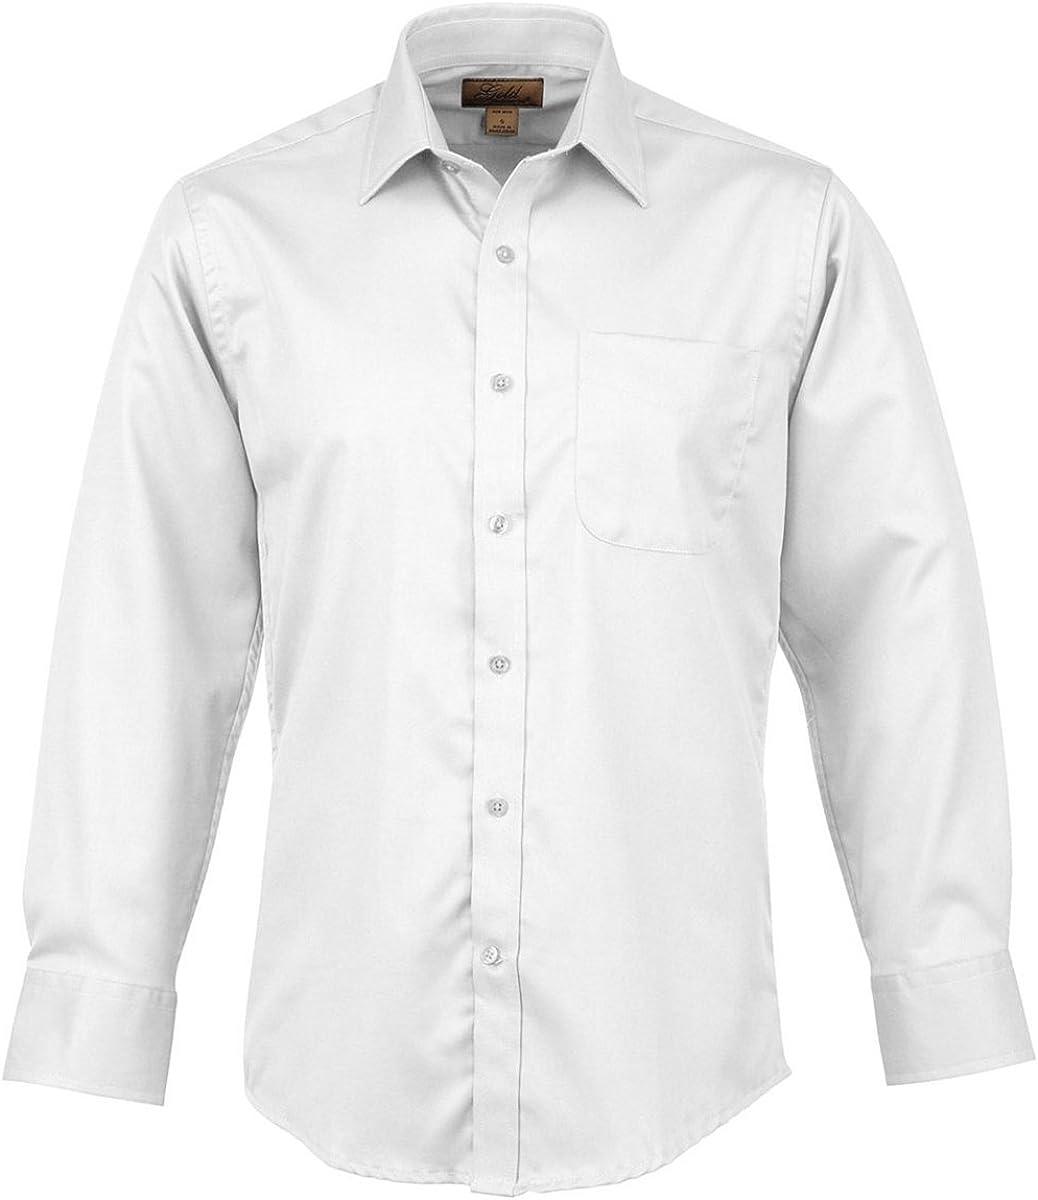 Tri-Mountain Gold Wrinkle Free 100% Cotton Twill Dress Shirt - 980 Blake